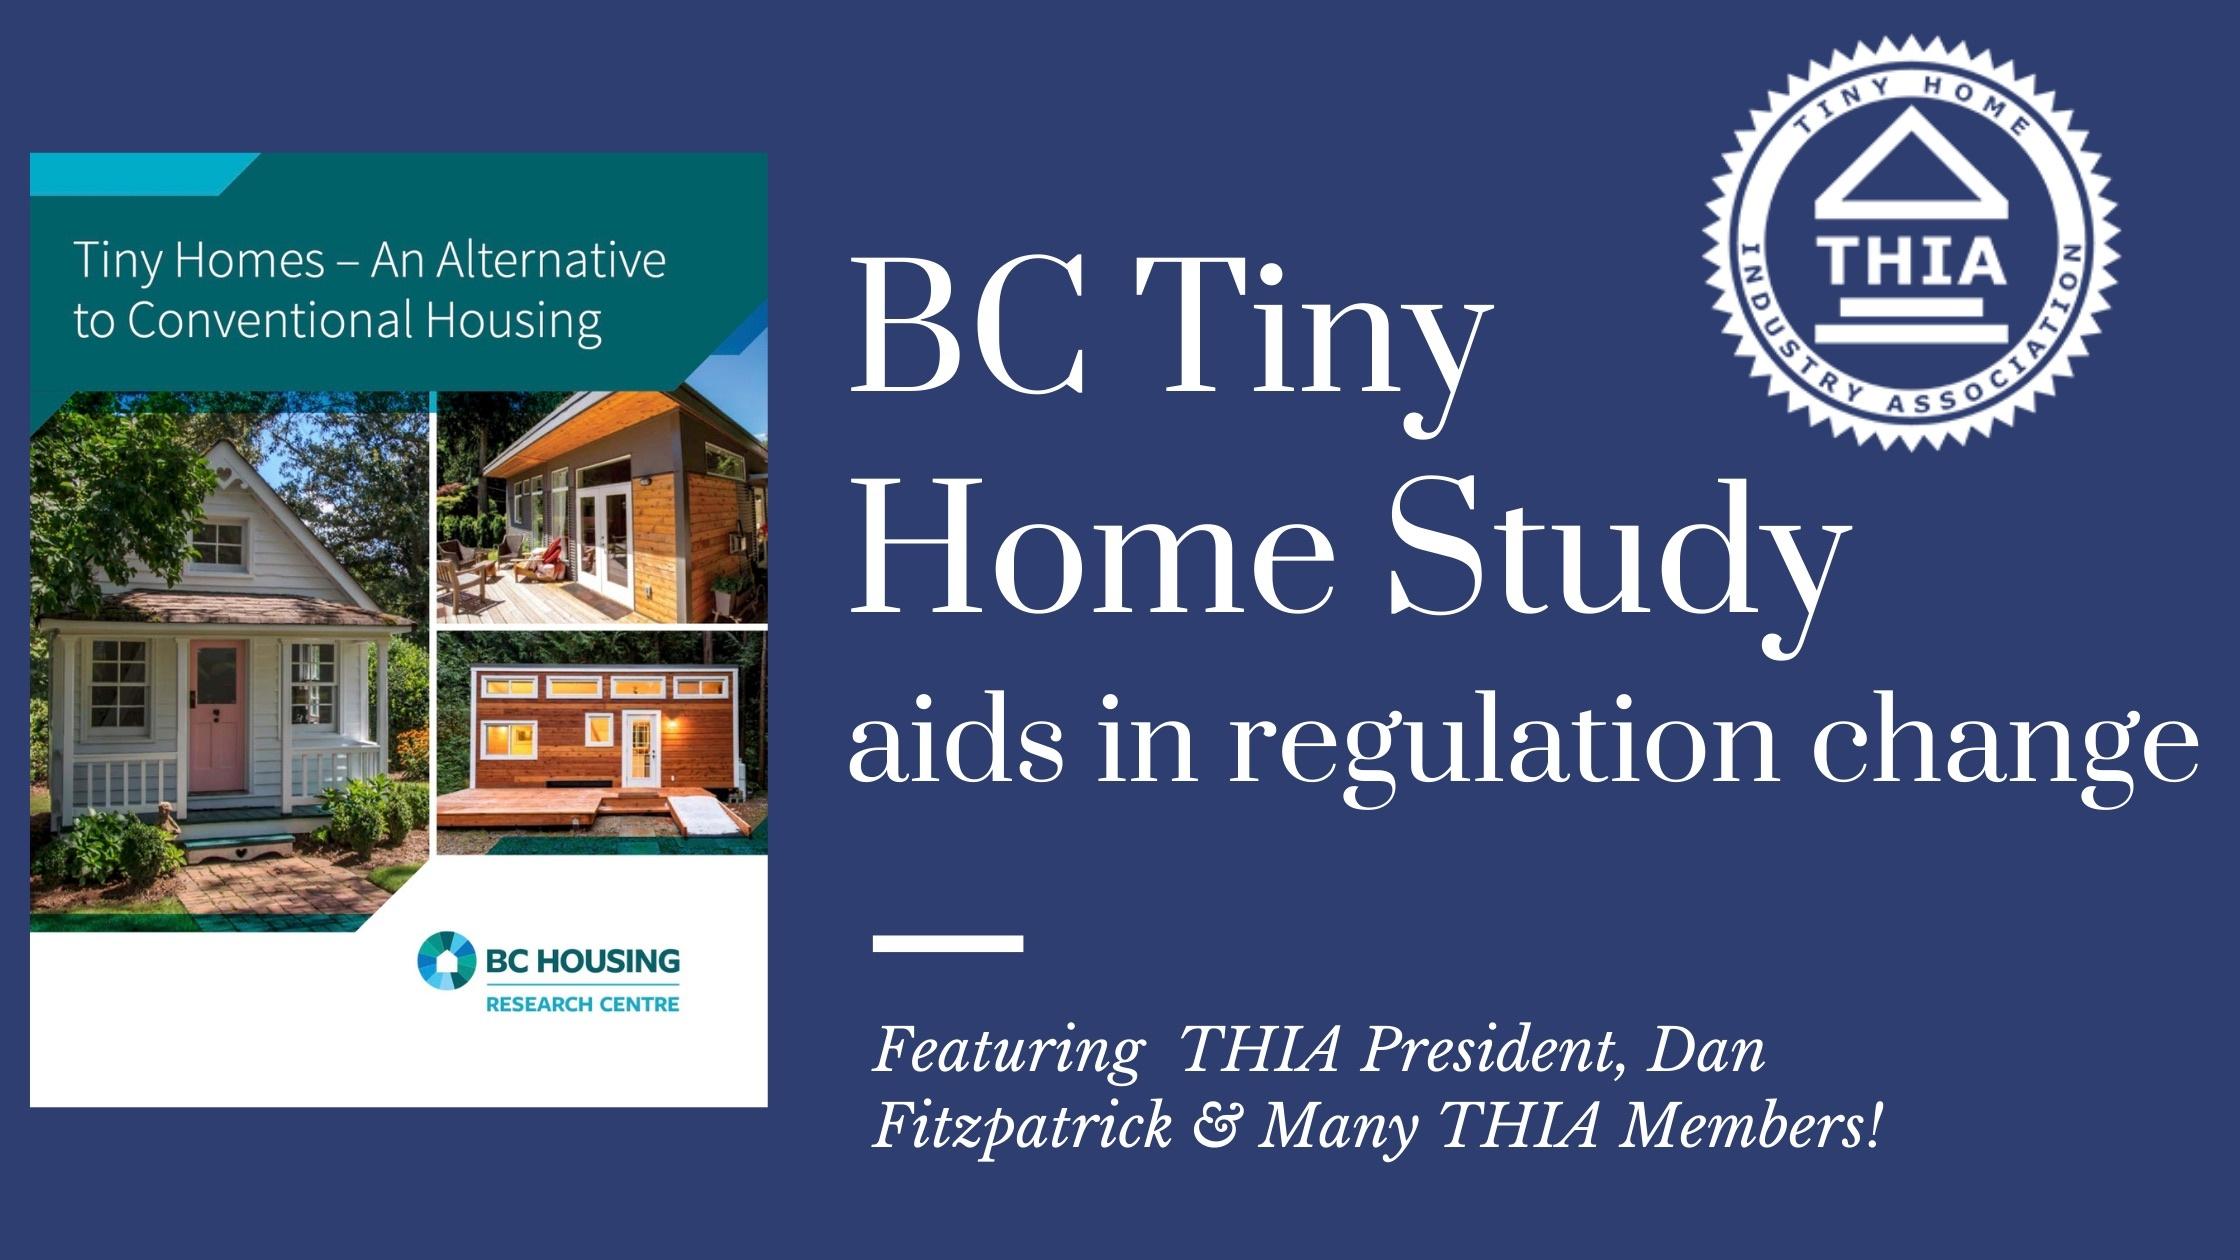 British Columbia Tiny Homes Report to Aid Regulation Change